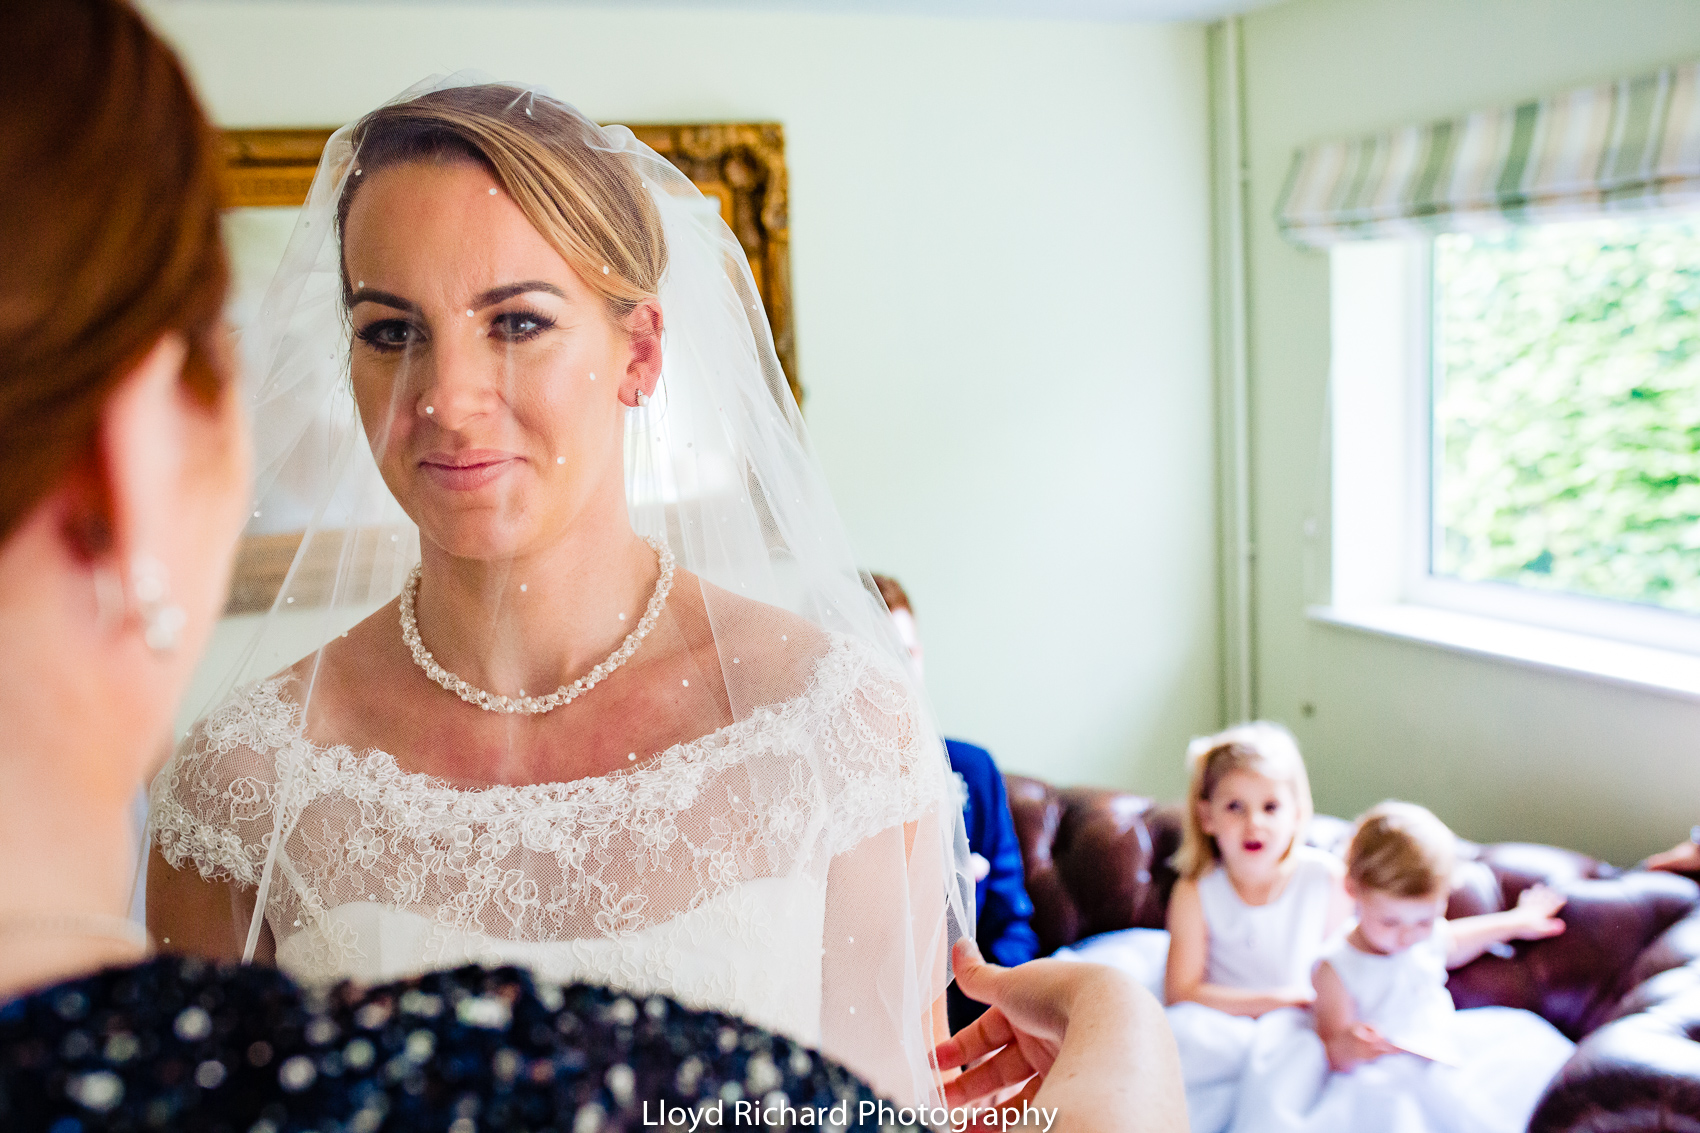 bride ready for the wedding at Pitt Hall Barn